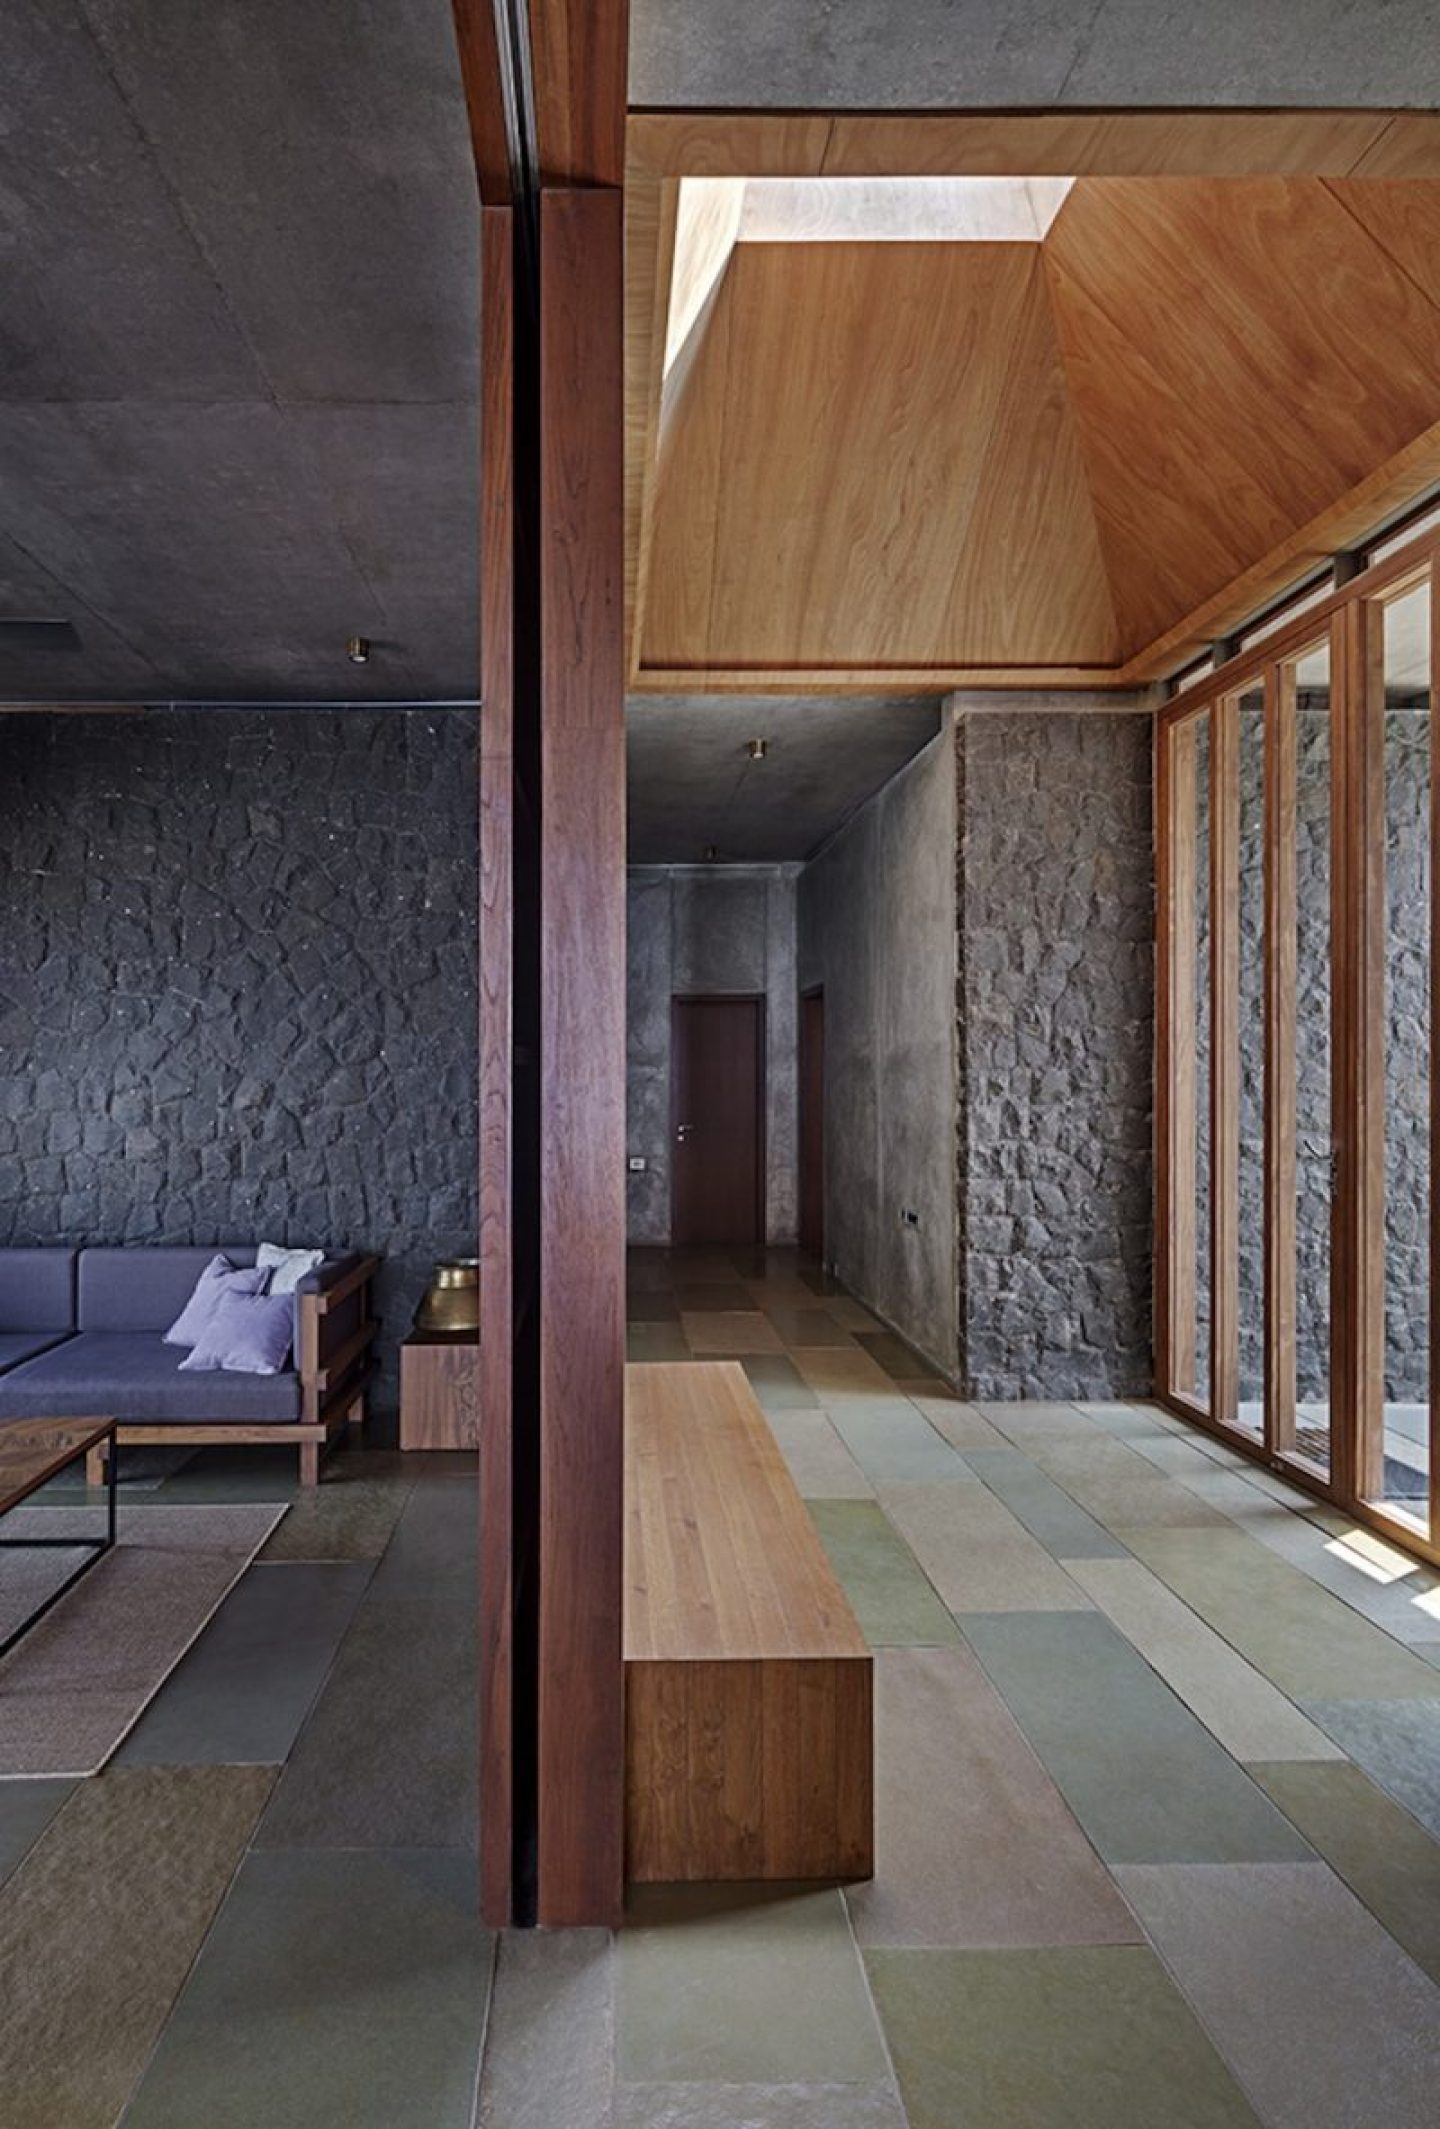 ignant_architecture_khosla_retreat_009